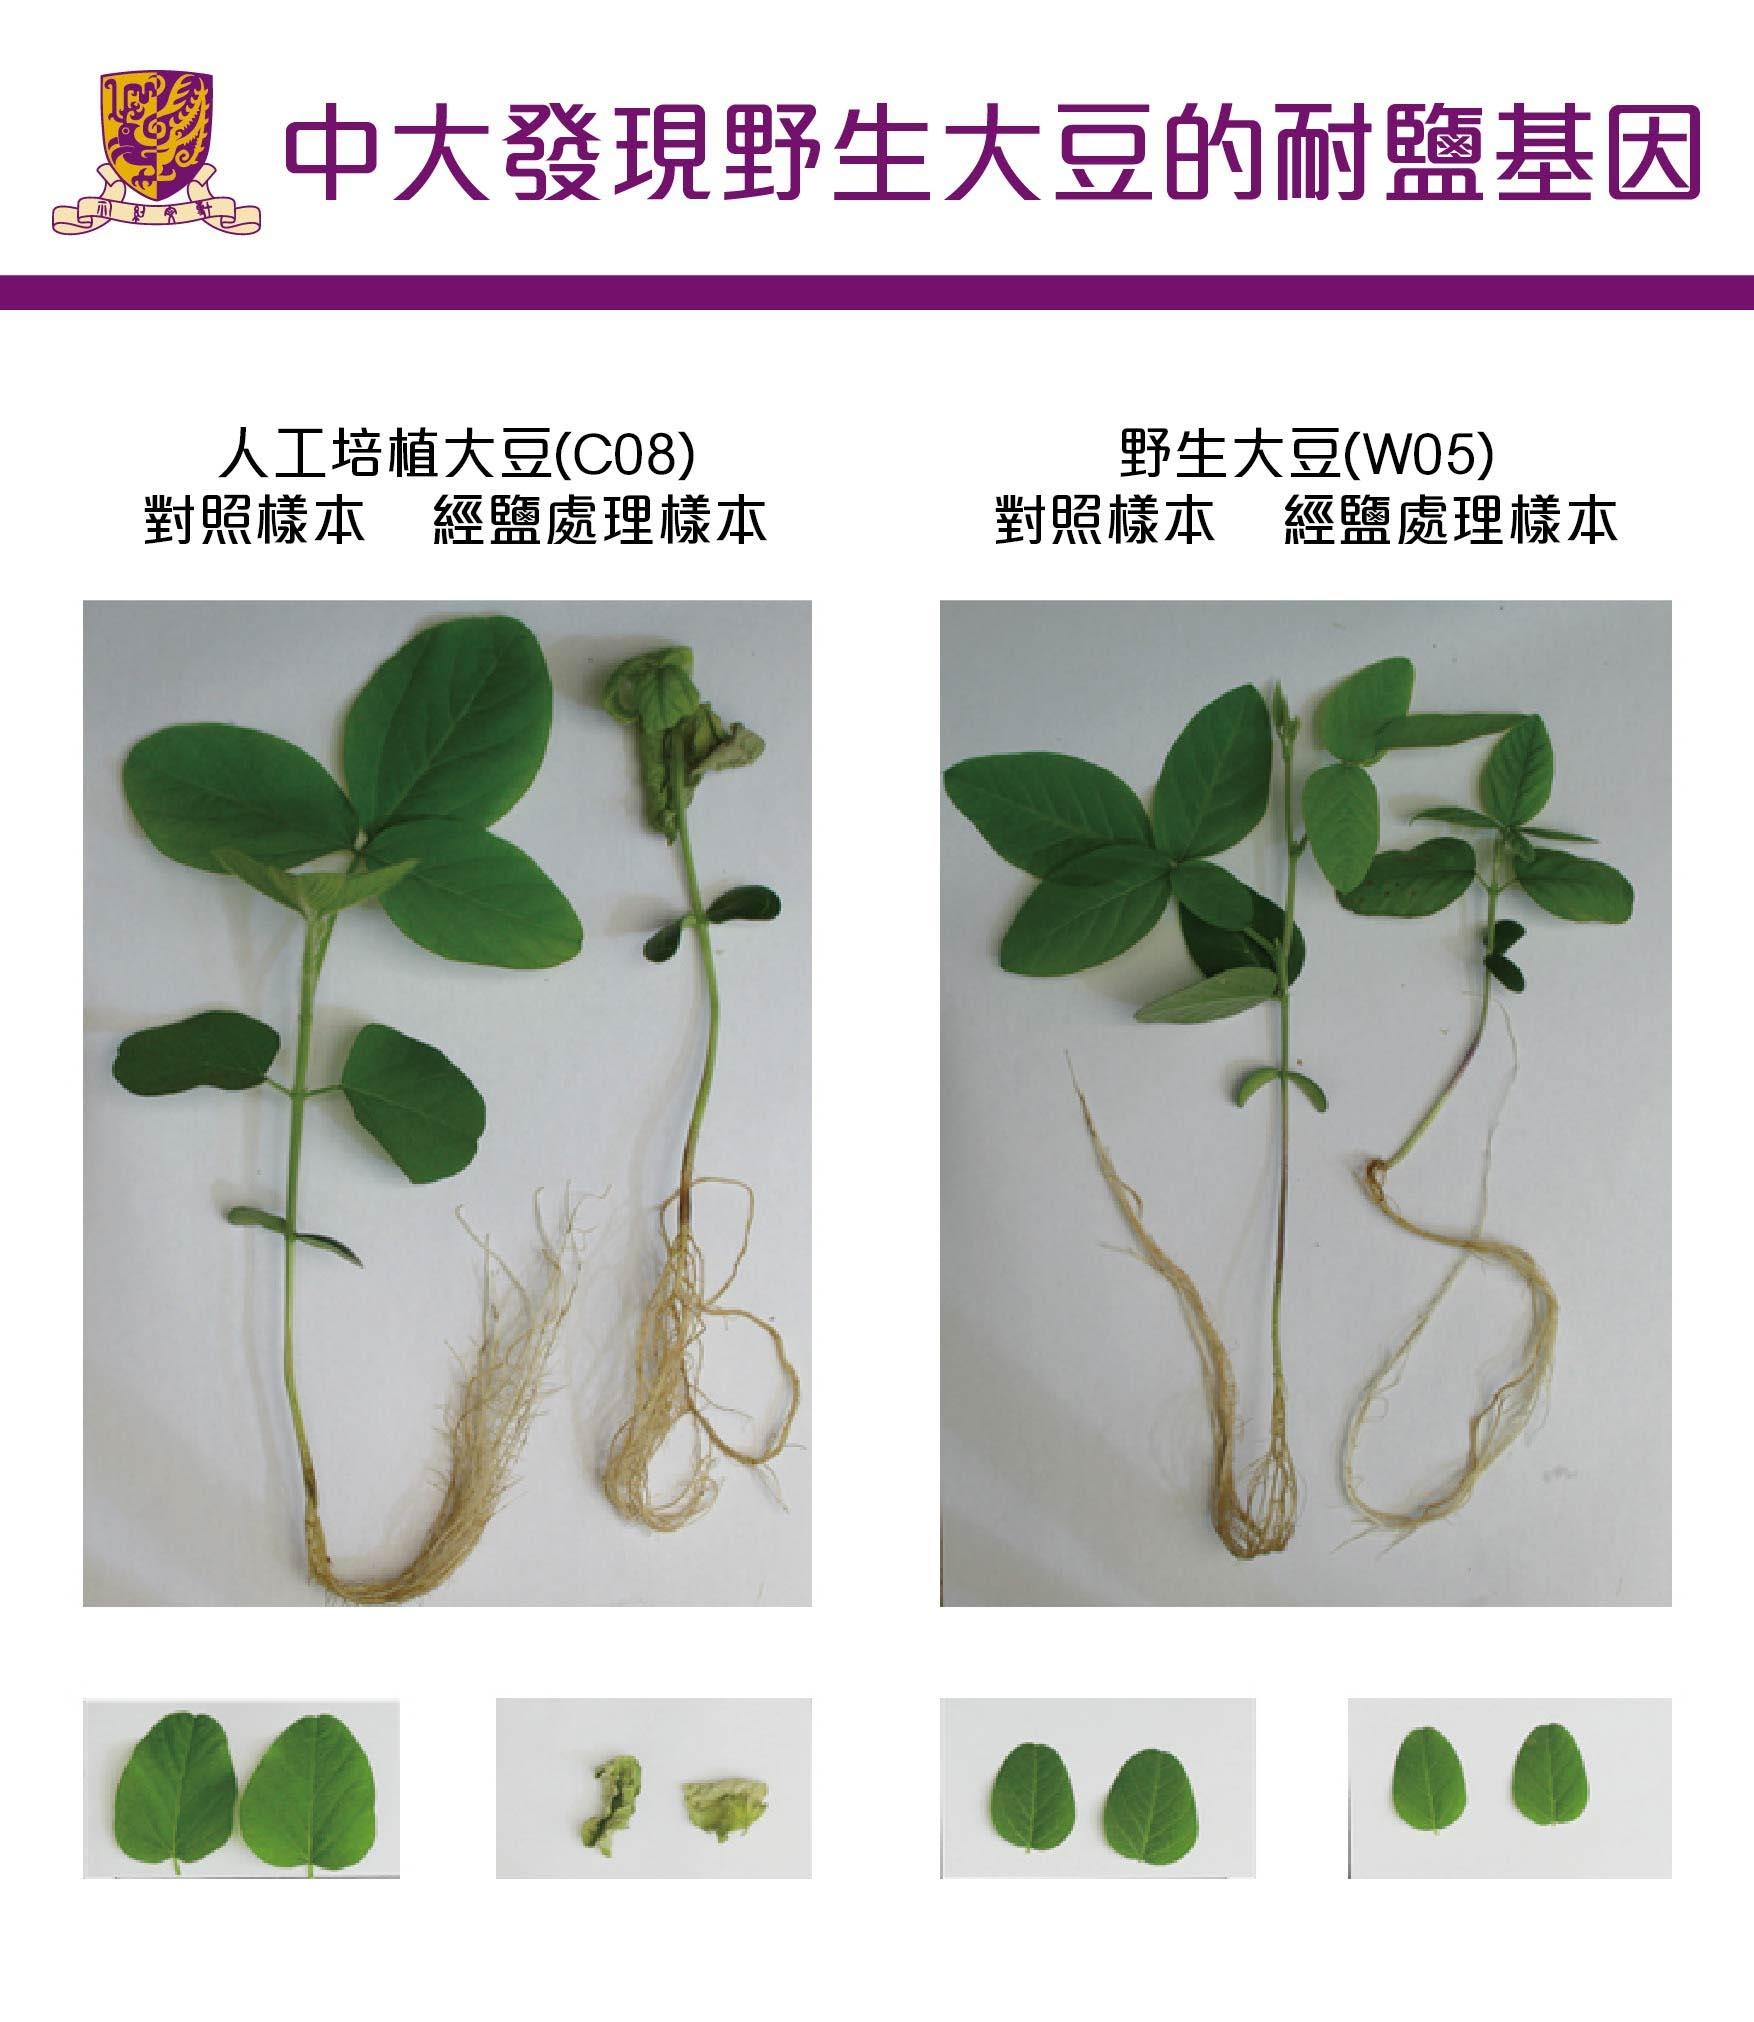 Wild soybean W05 is less salt-sensitive than cultivated soybean C08.